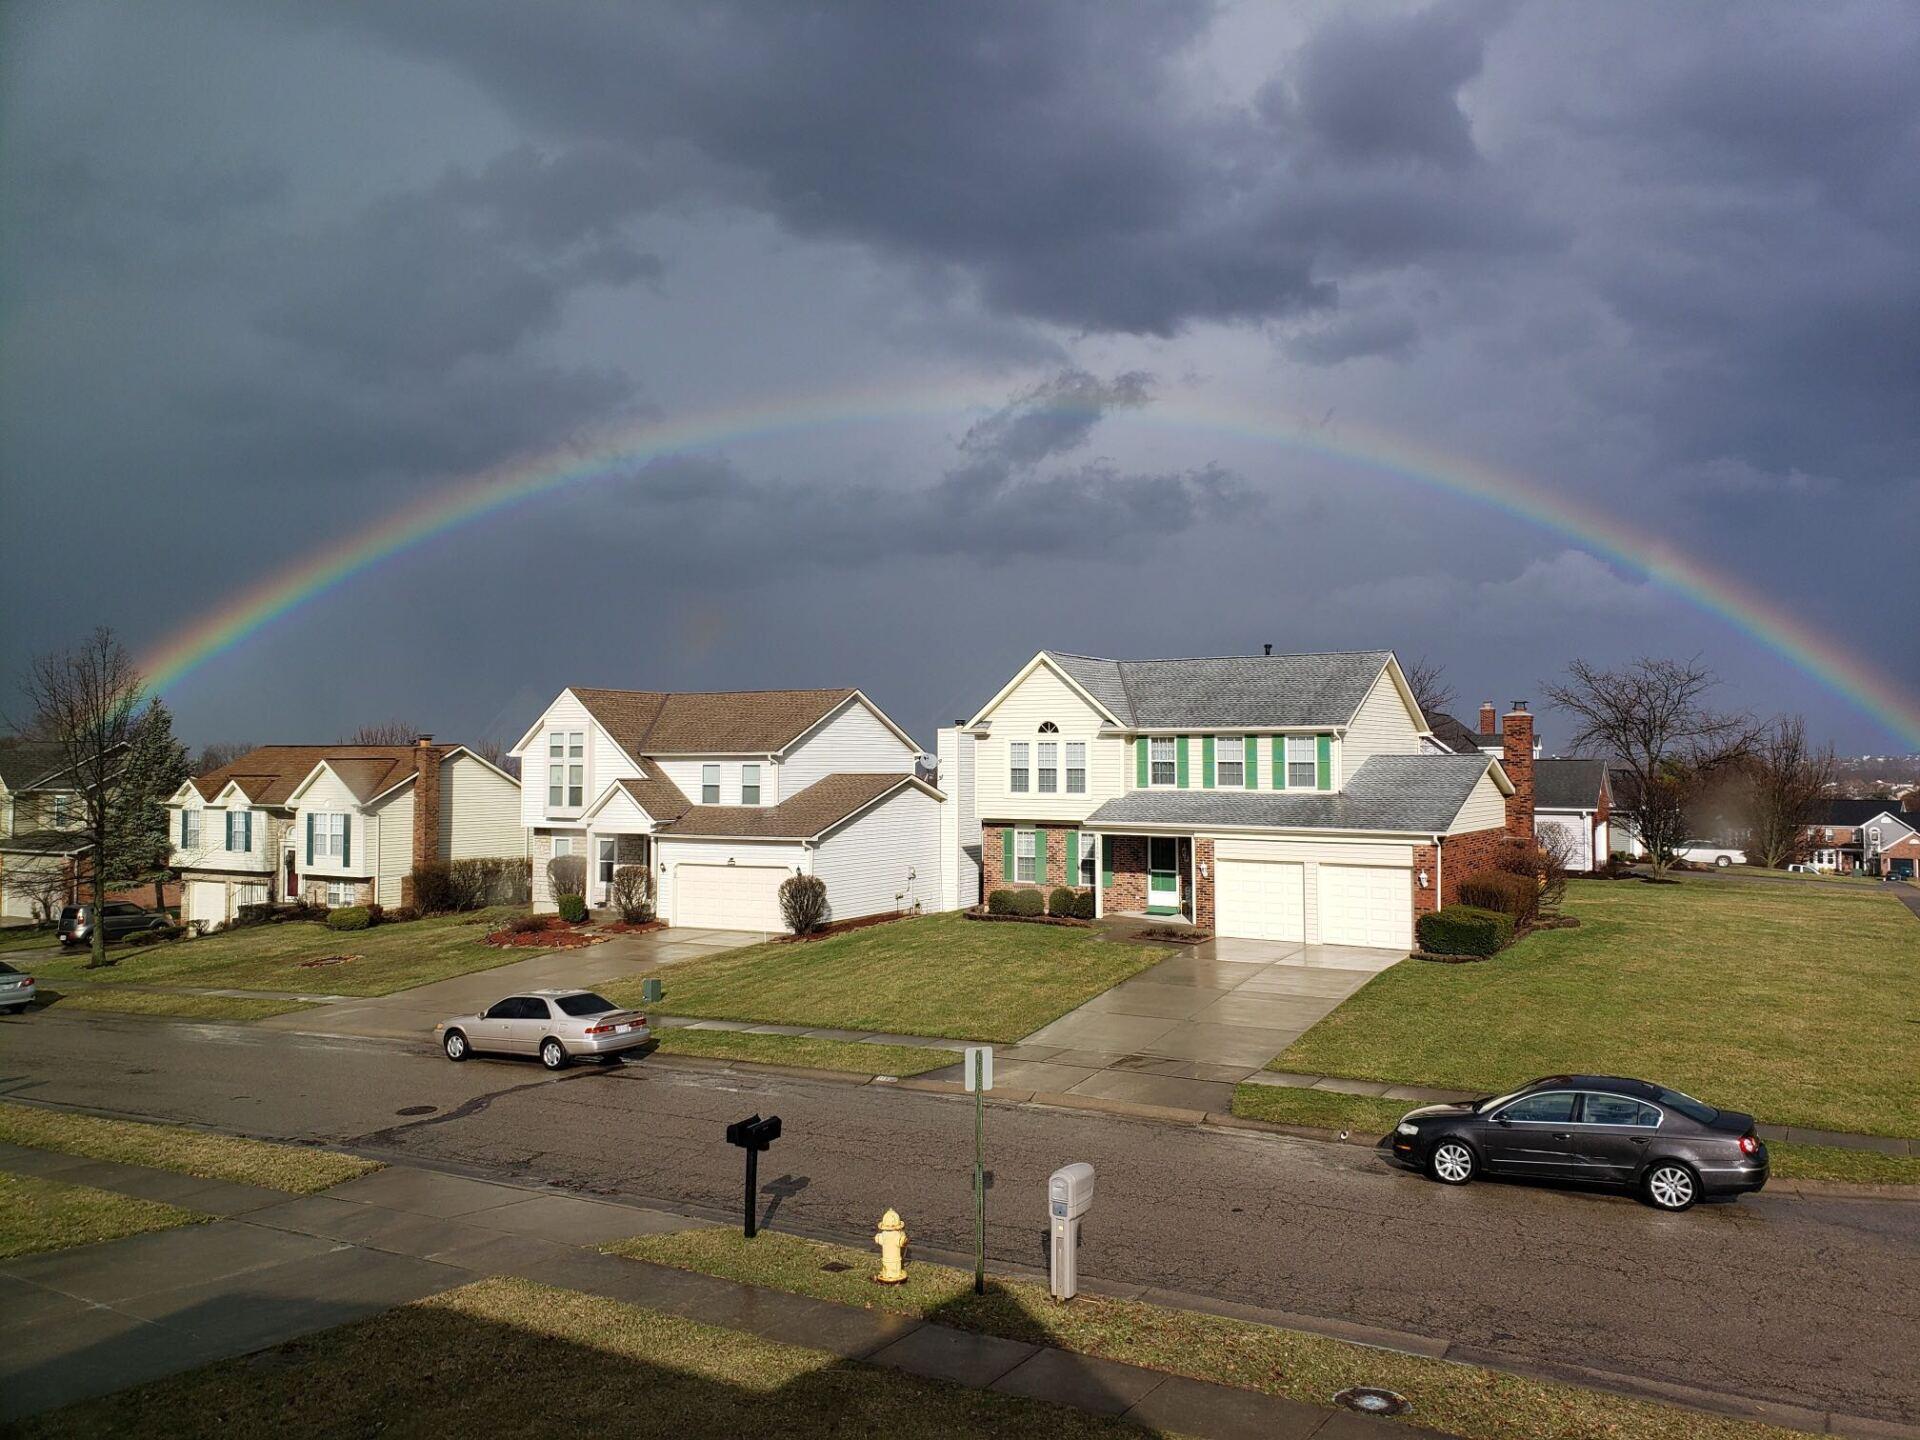 Storm_031419_Raibow_Colerain_Township__Gale_Burkhart.jpg